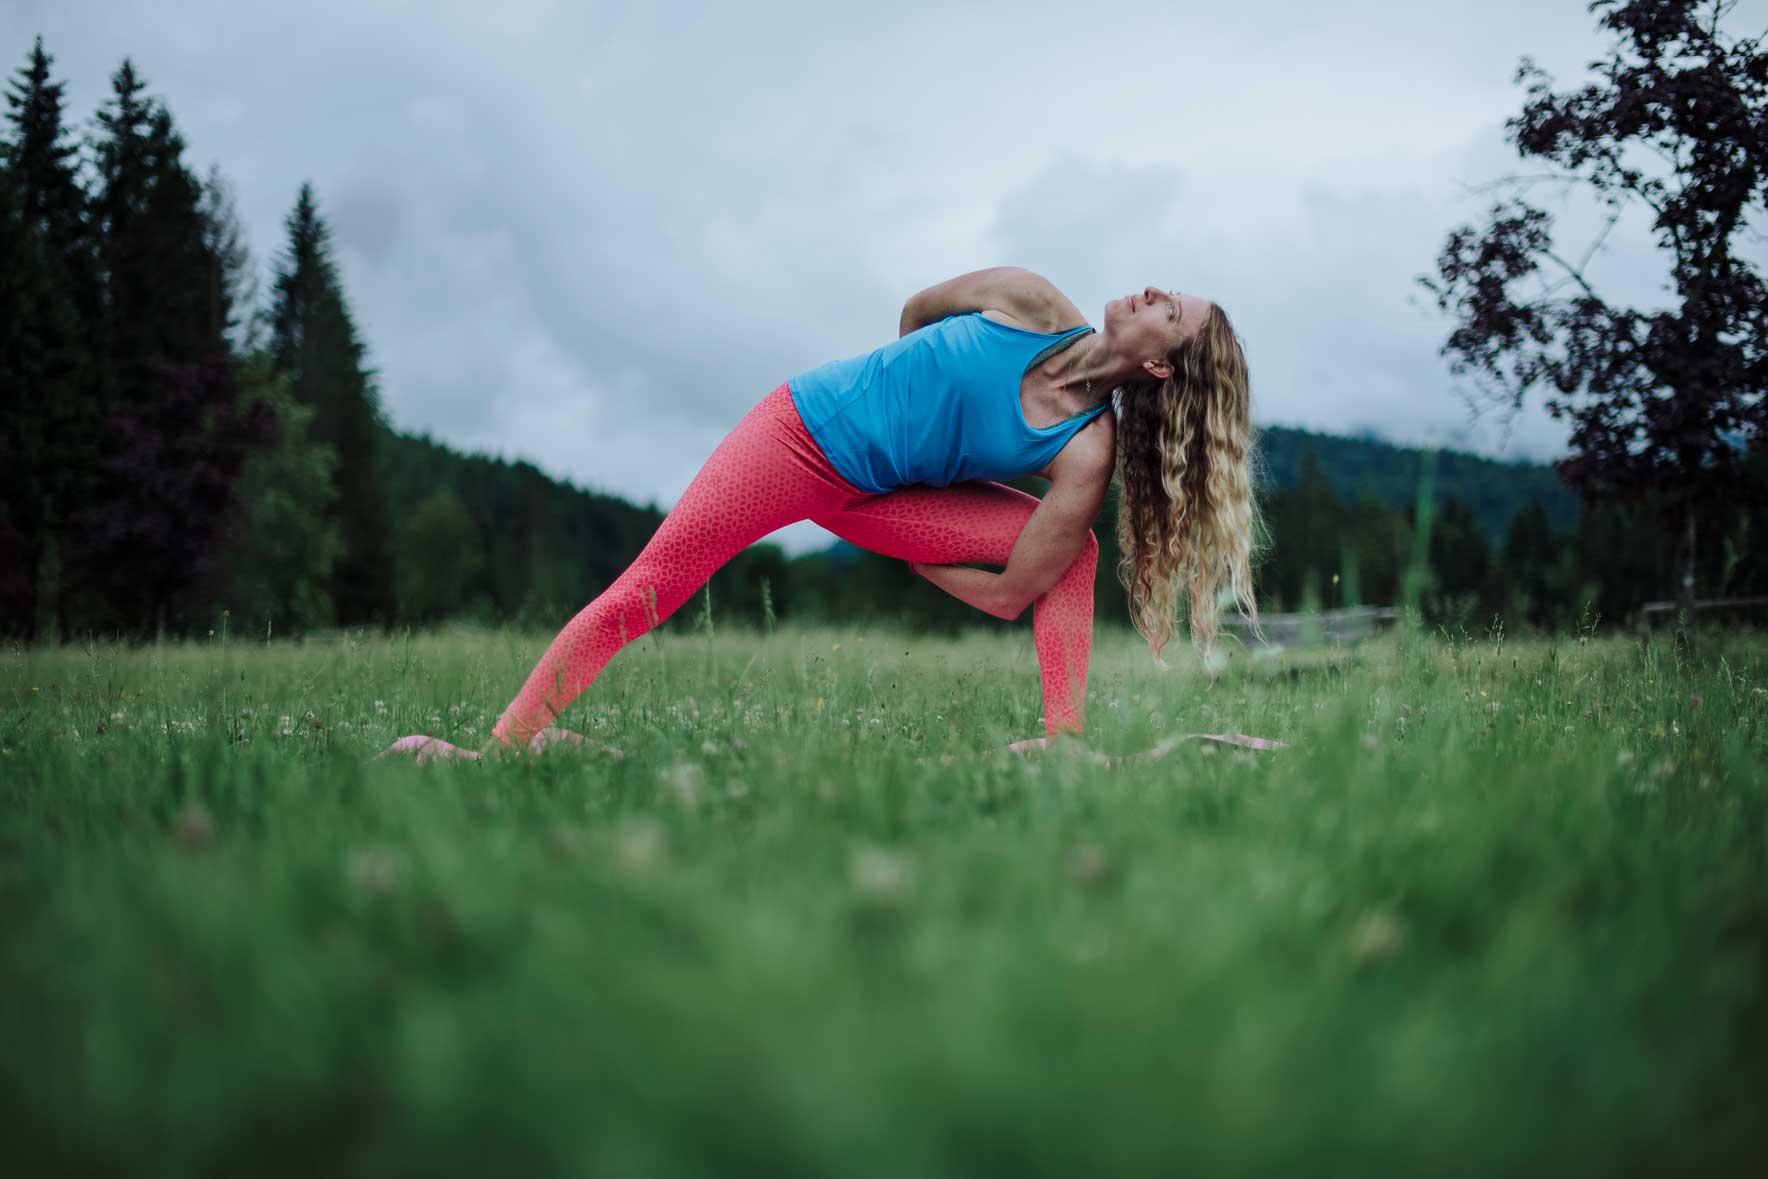 salomon-any-path-your-way-yoga-christine-prechsl-munichmountaingirls-claudia-ziegler